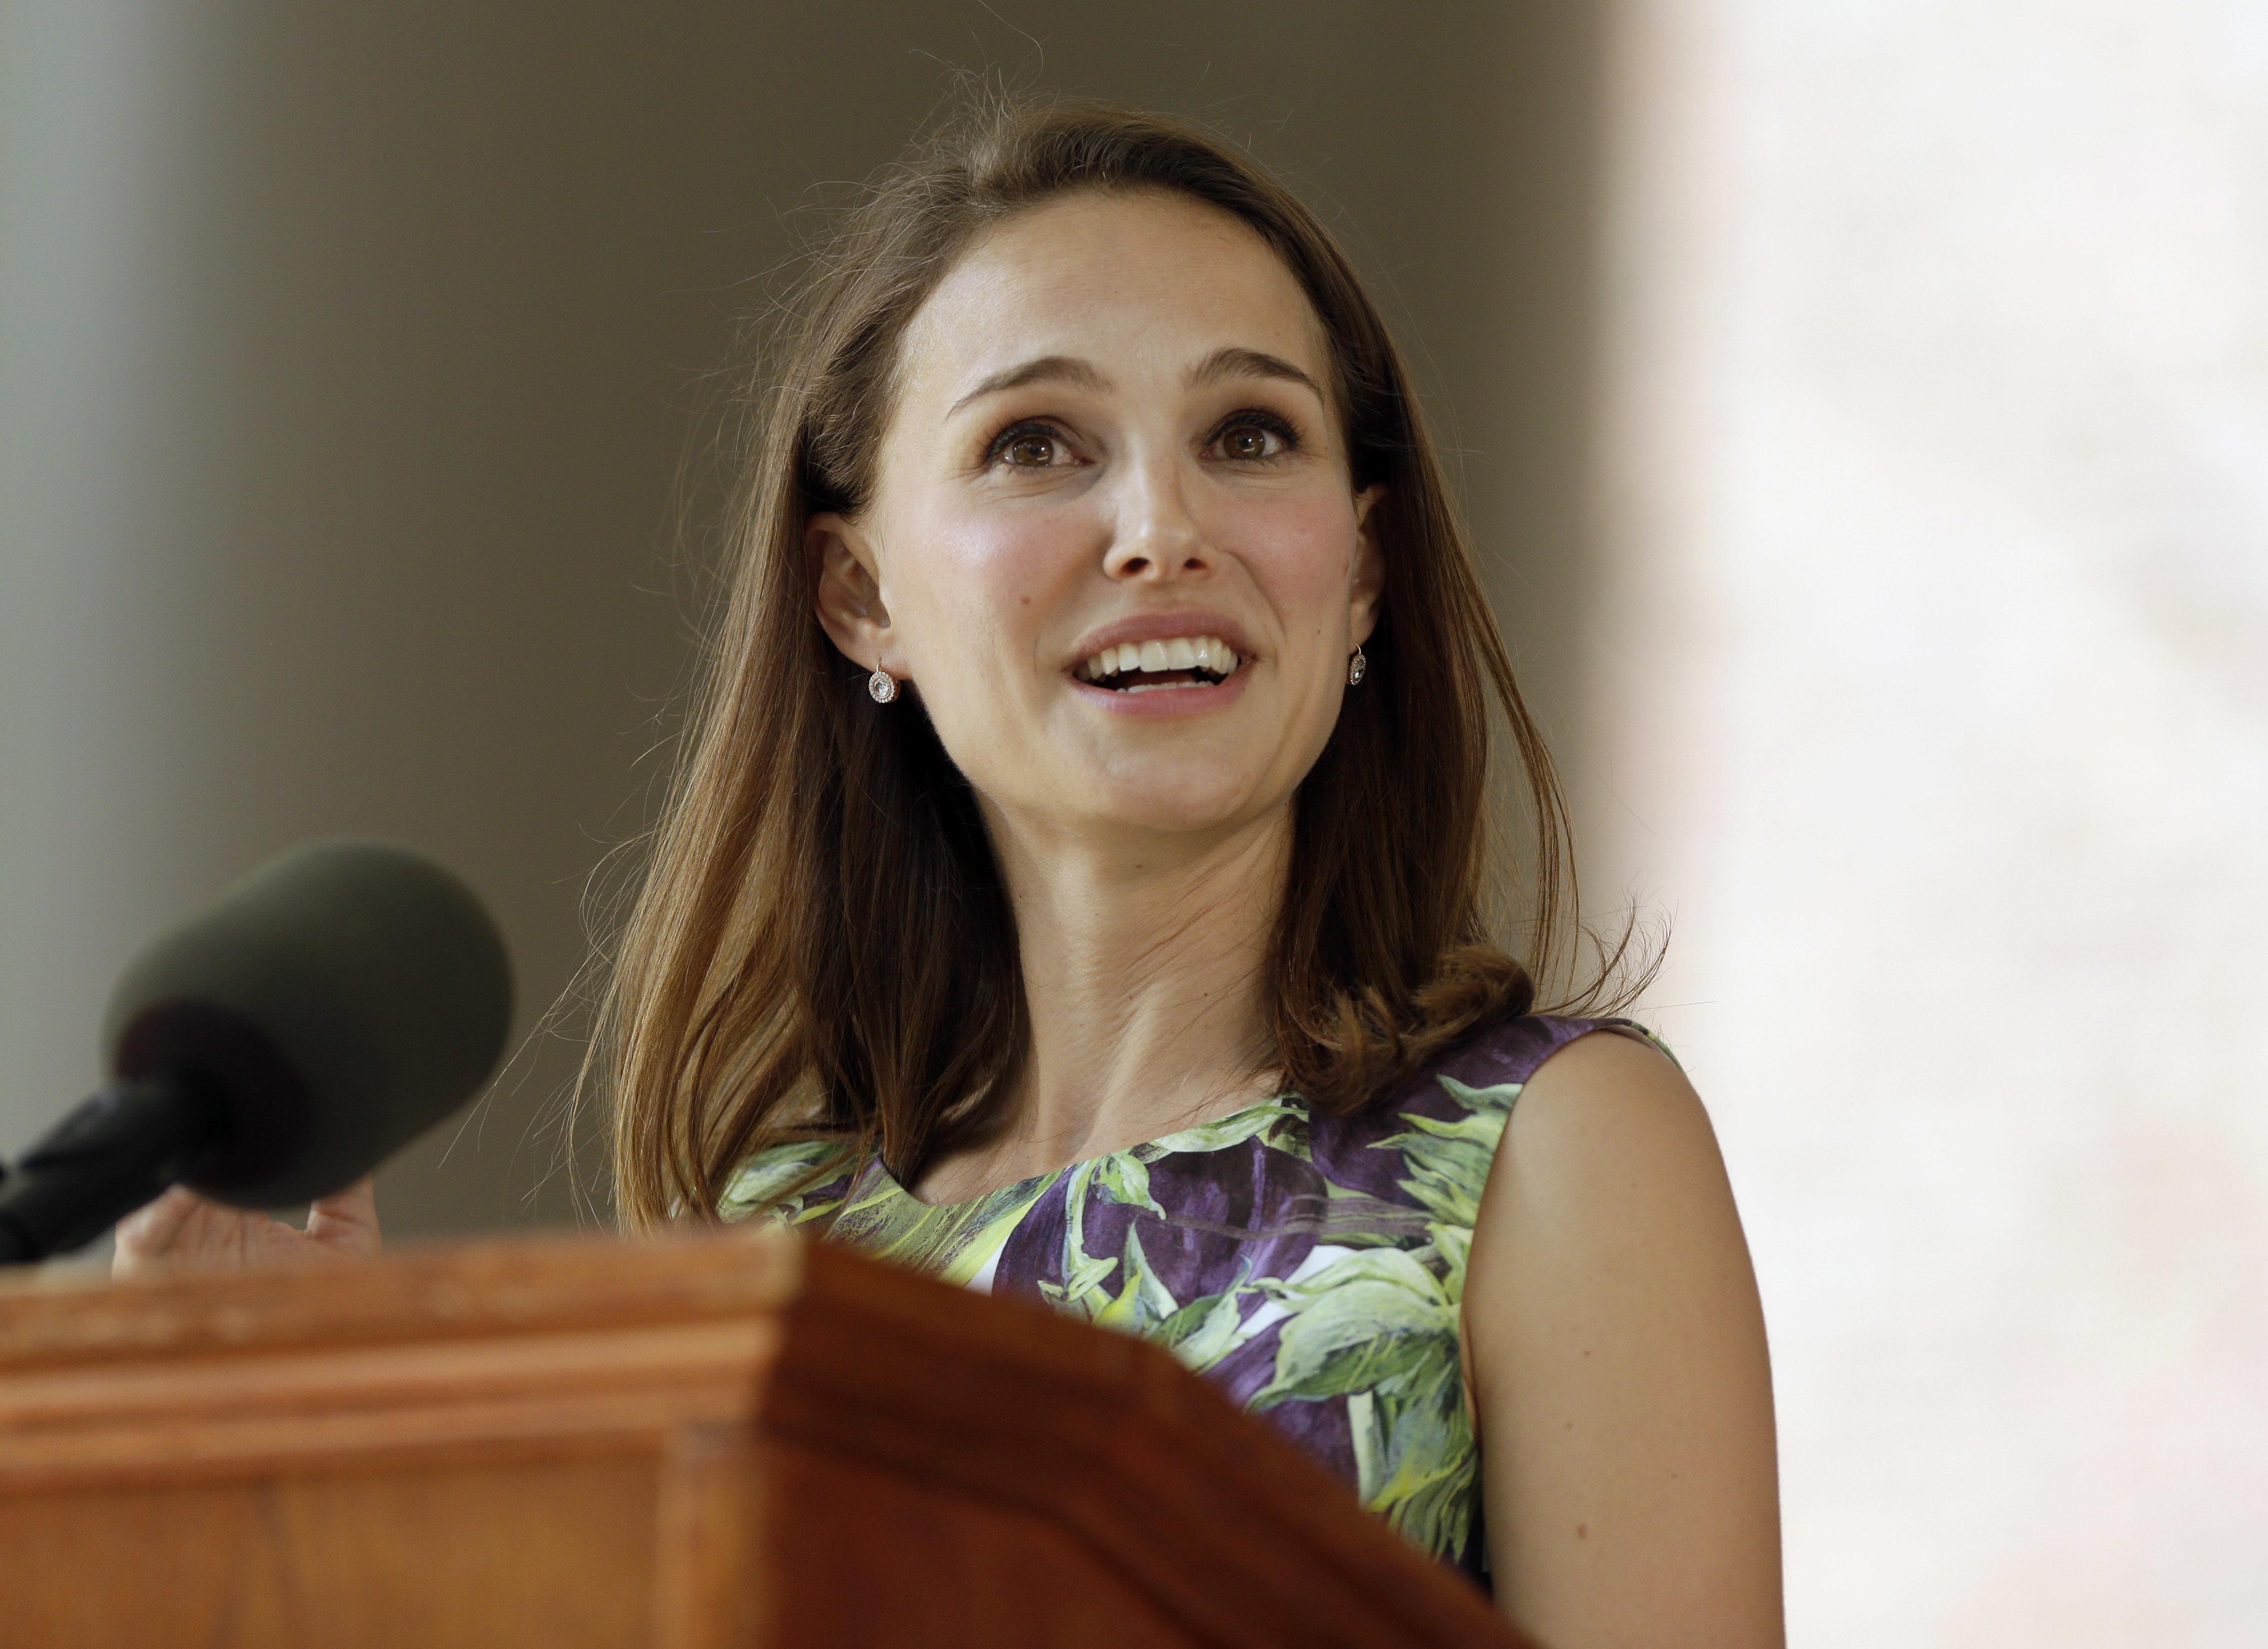 Natalie Portman reveals dark times in Harvard speech